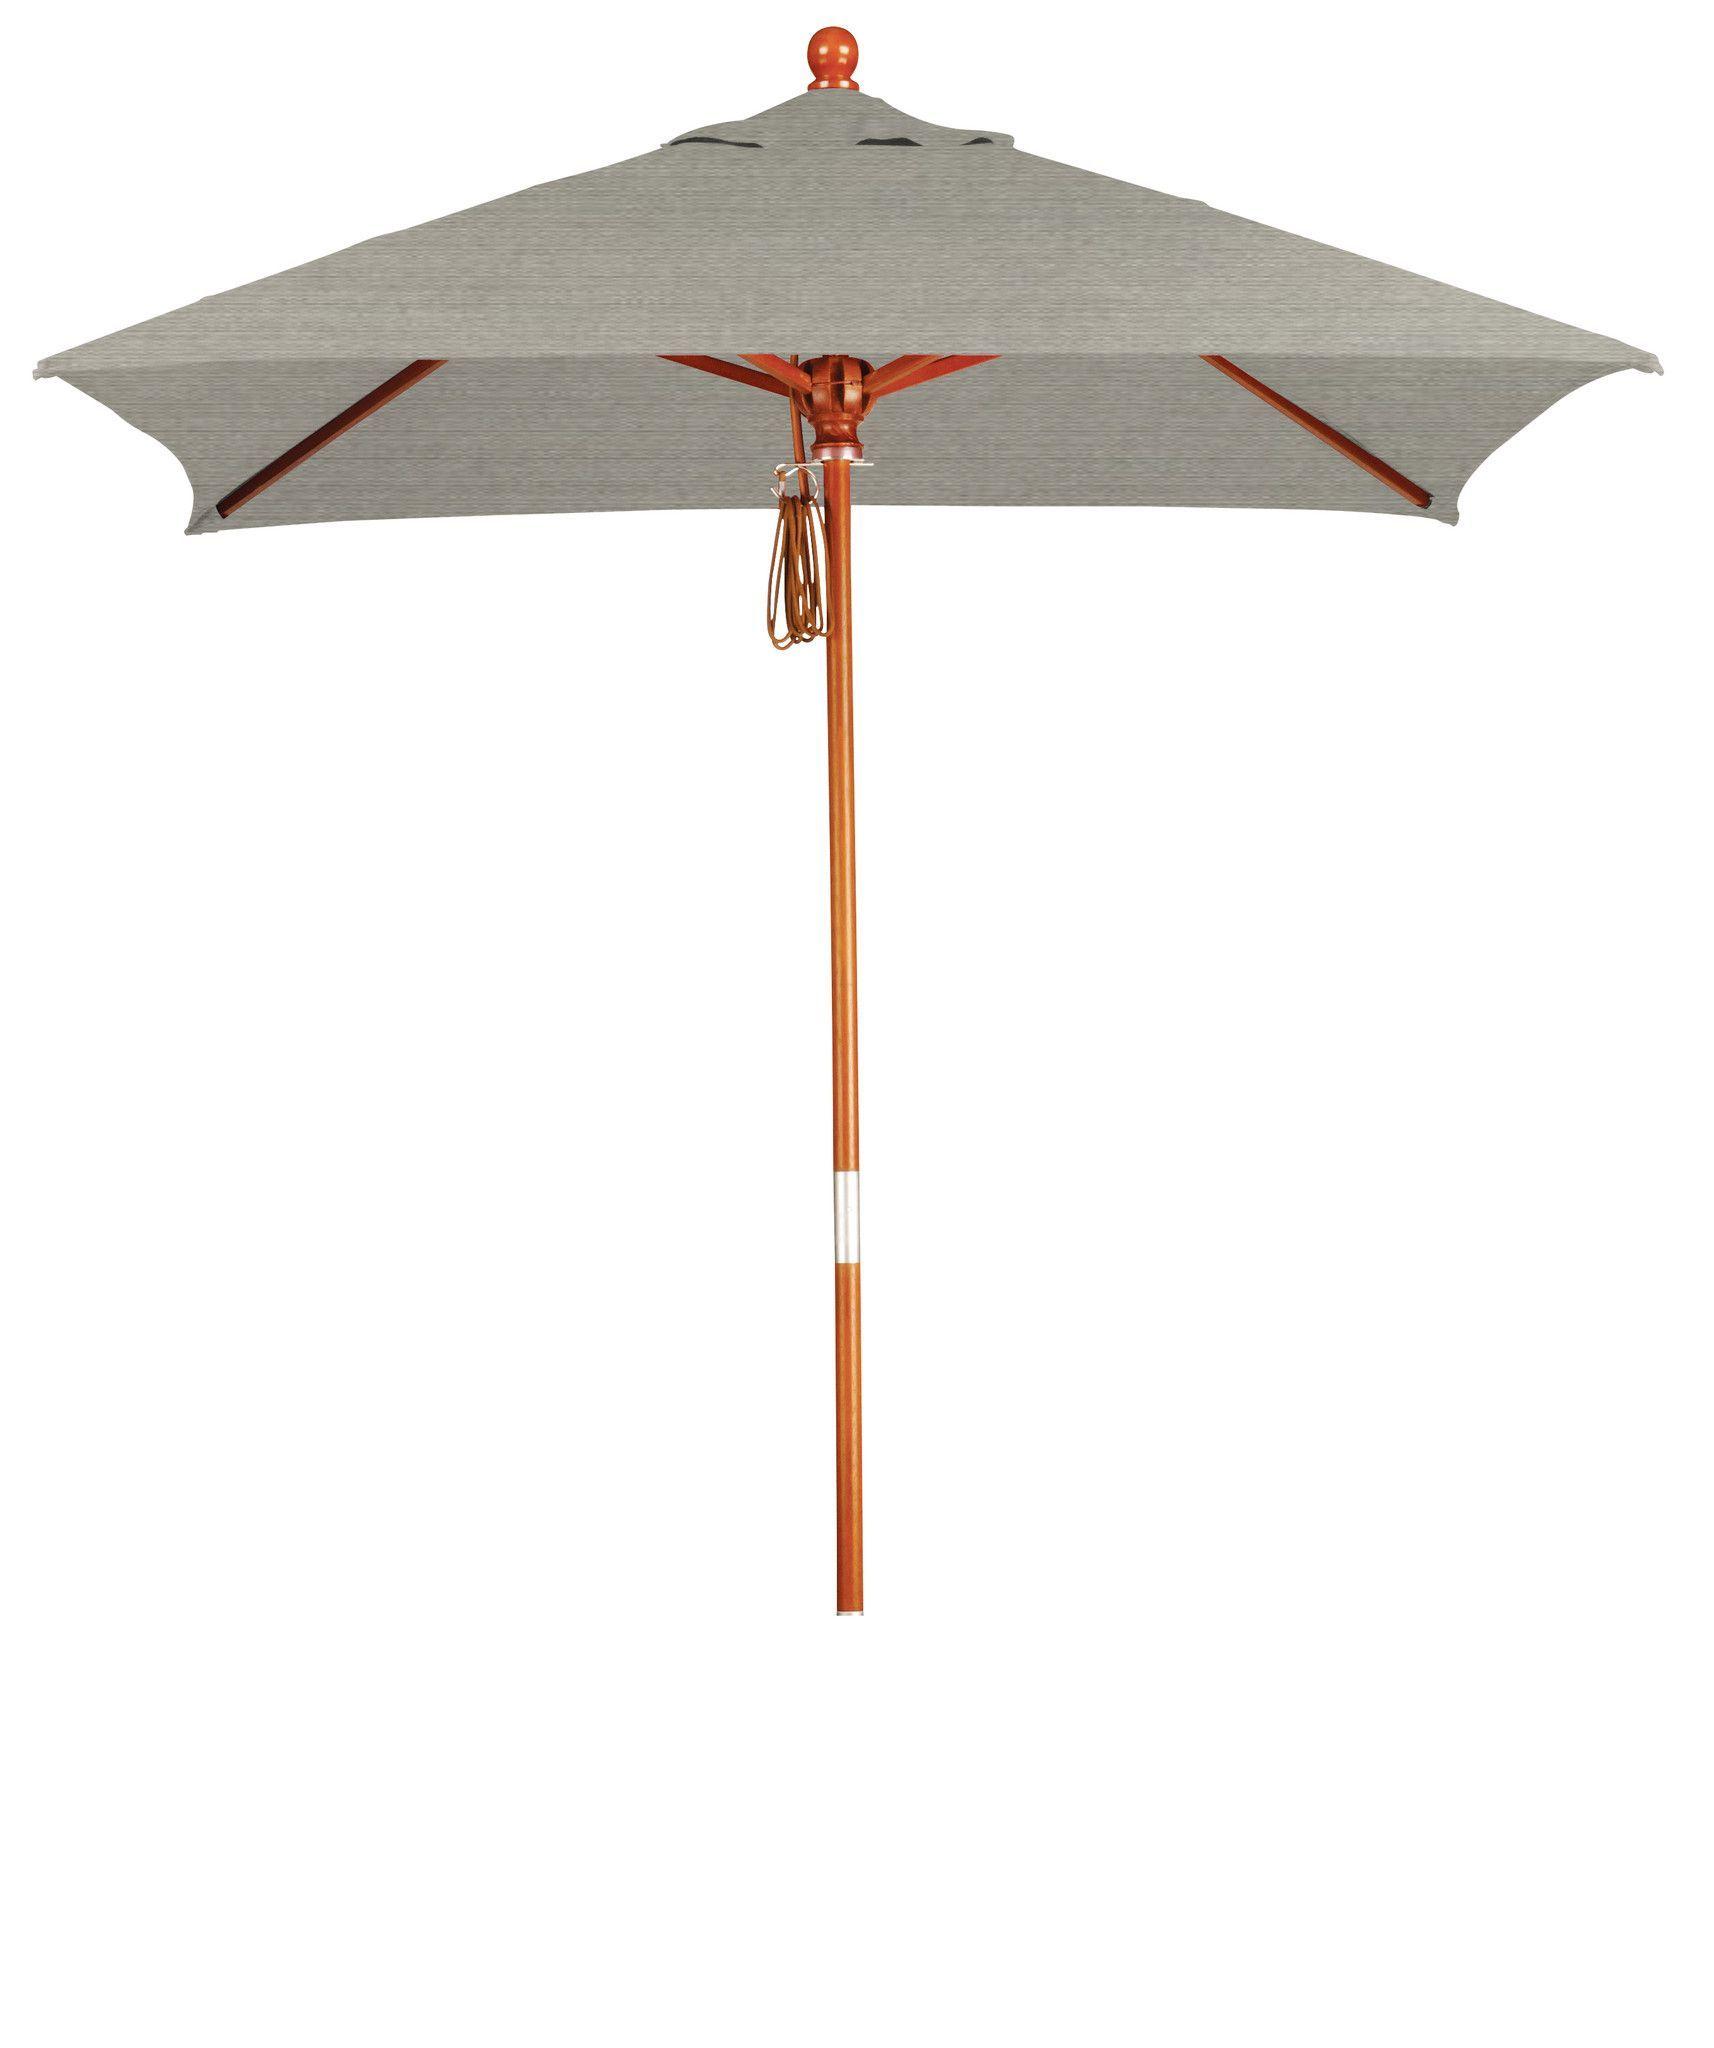 Eclipse Collection 6'x6' Wood Market Umbrella Pulley Open Marenti Wood/Sunbrella/Spectrum Dove